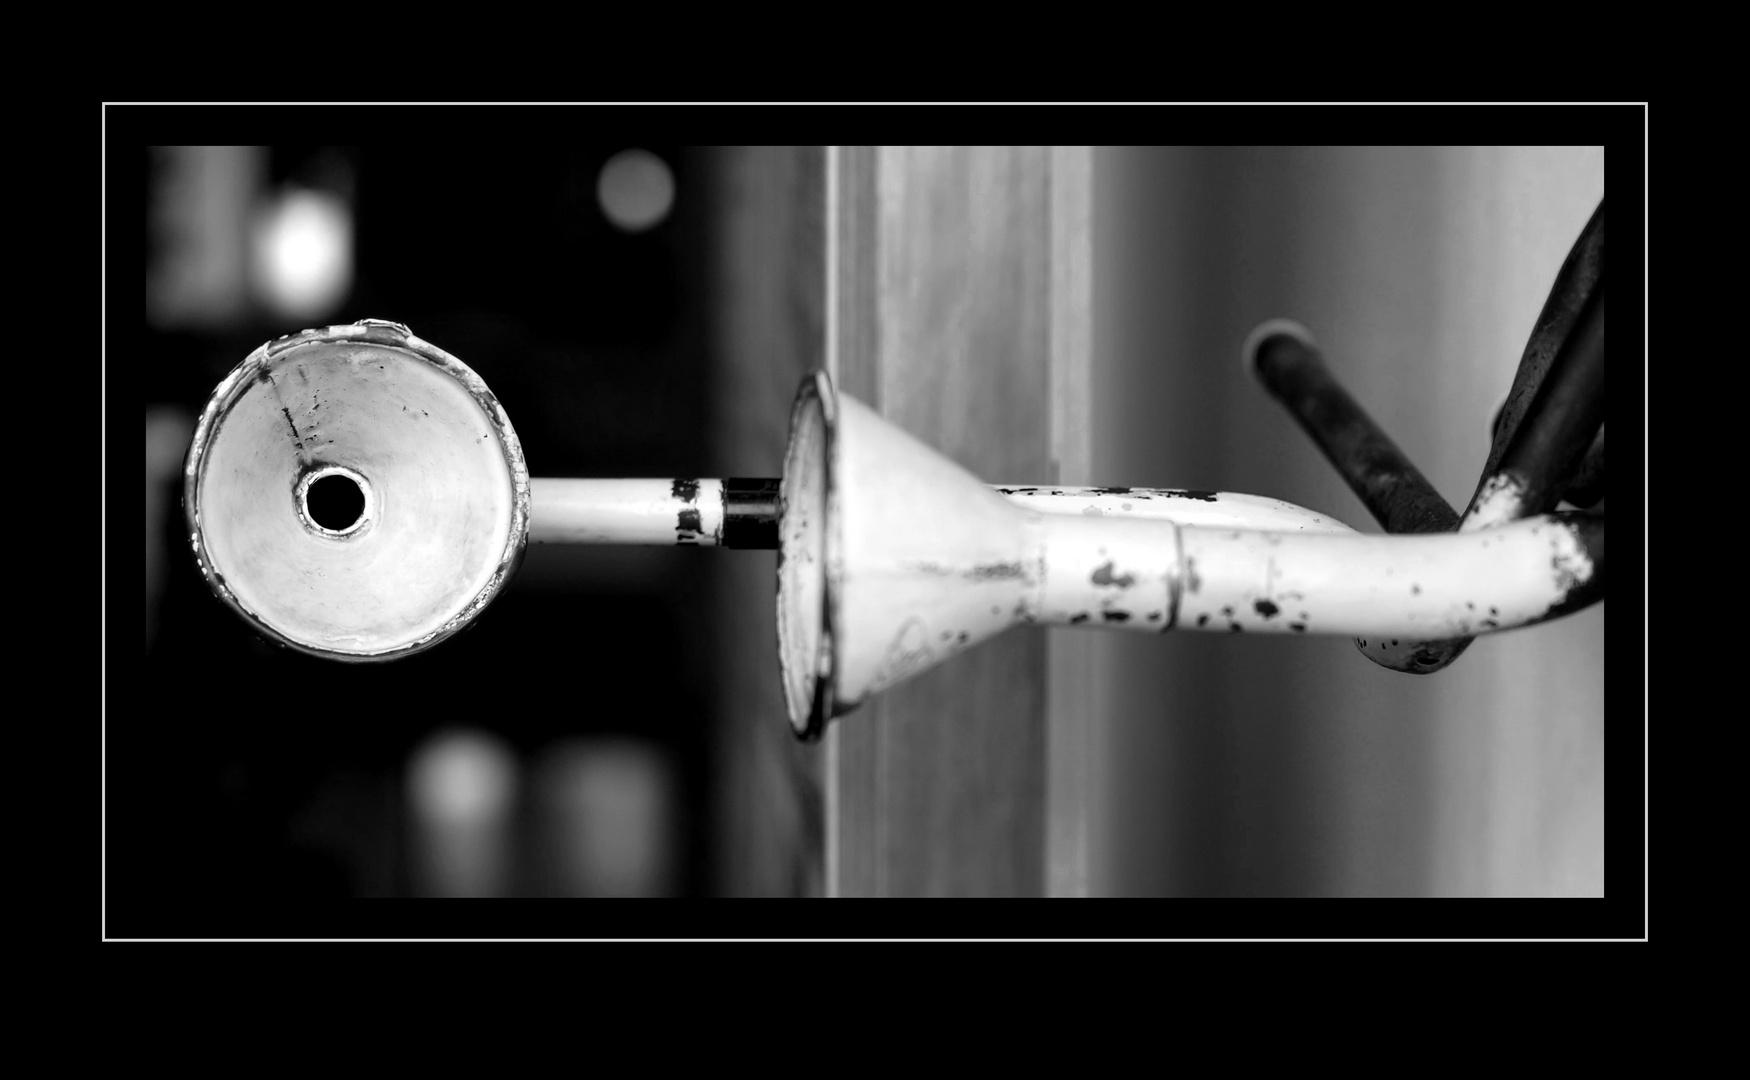 Haustelefon, nicht DECT-fähig